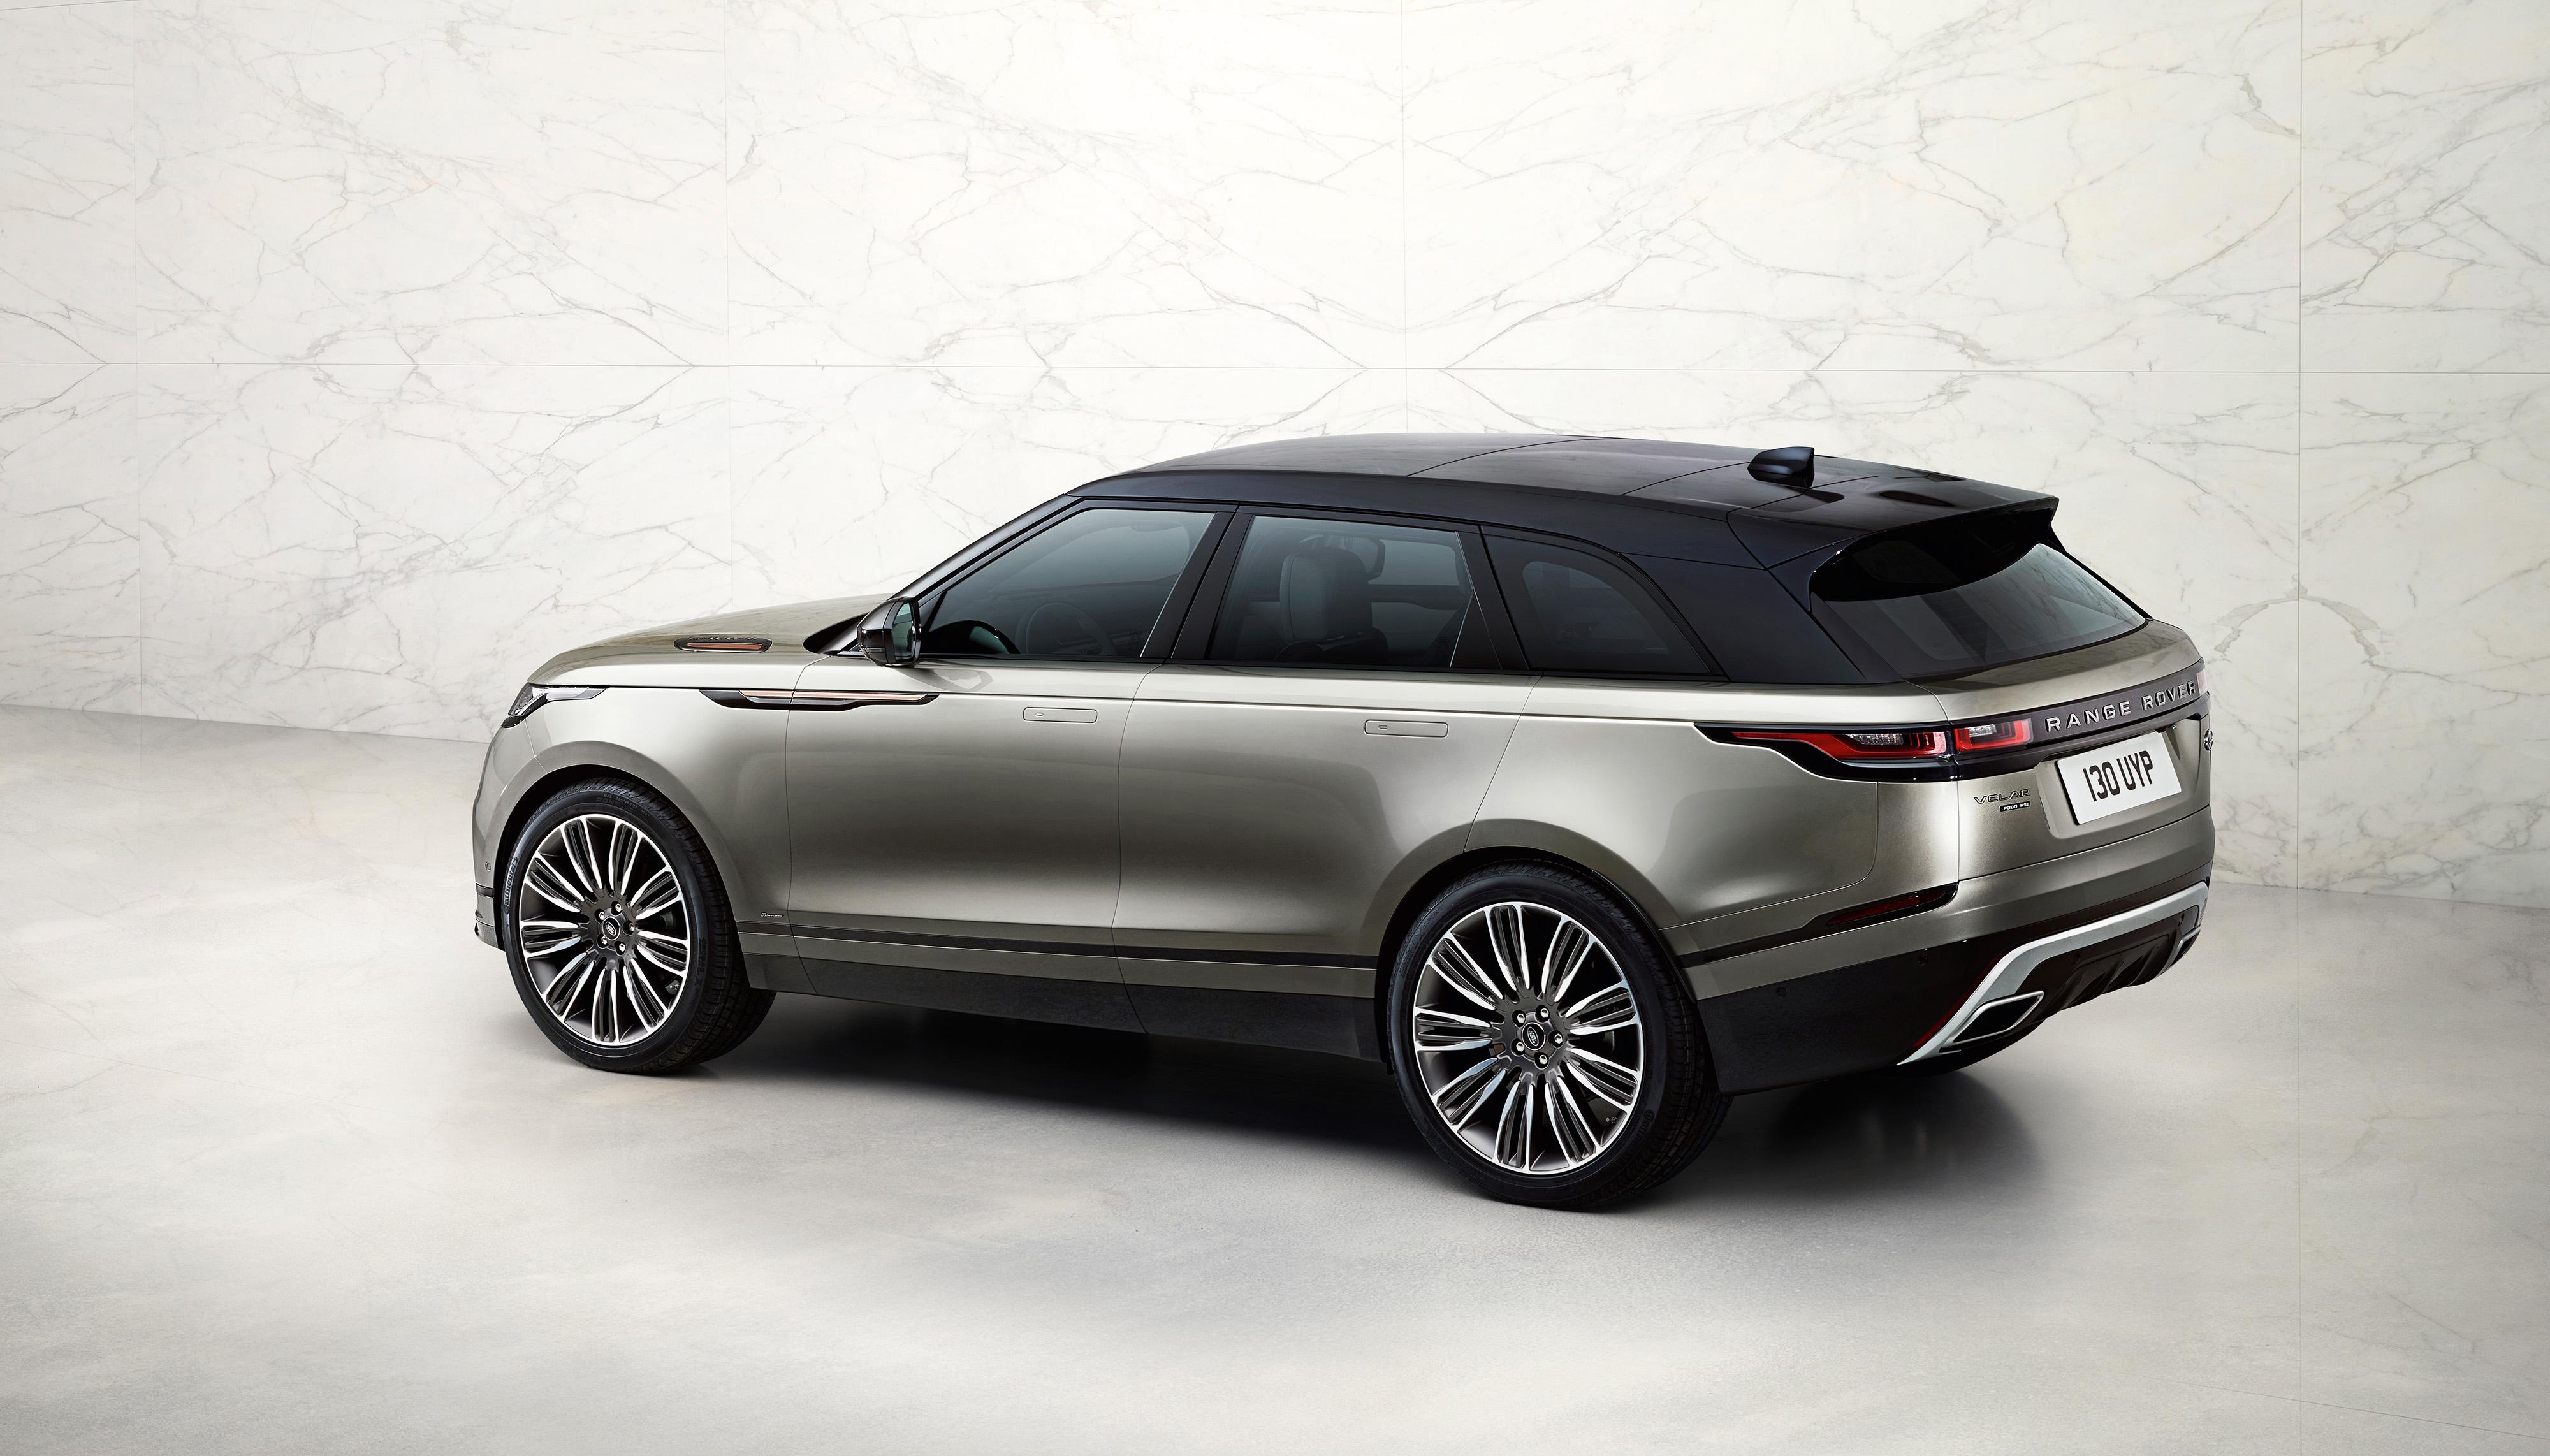 2018 Range Rover Velar: Specs, Design, Price >> Range Rover Velar Review A Handsome Slab Of British Luxury